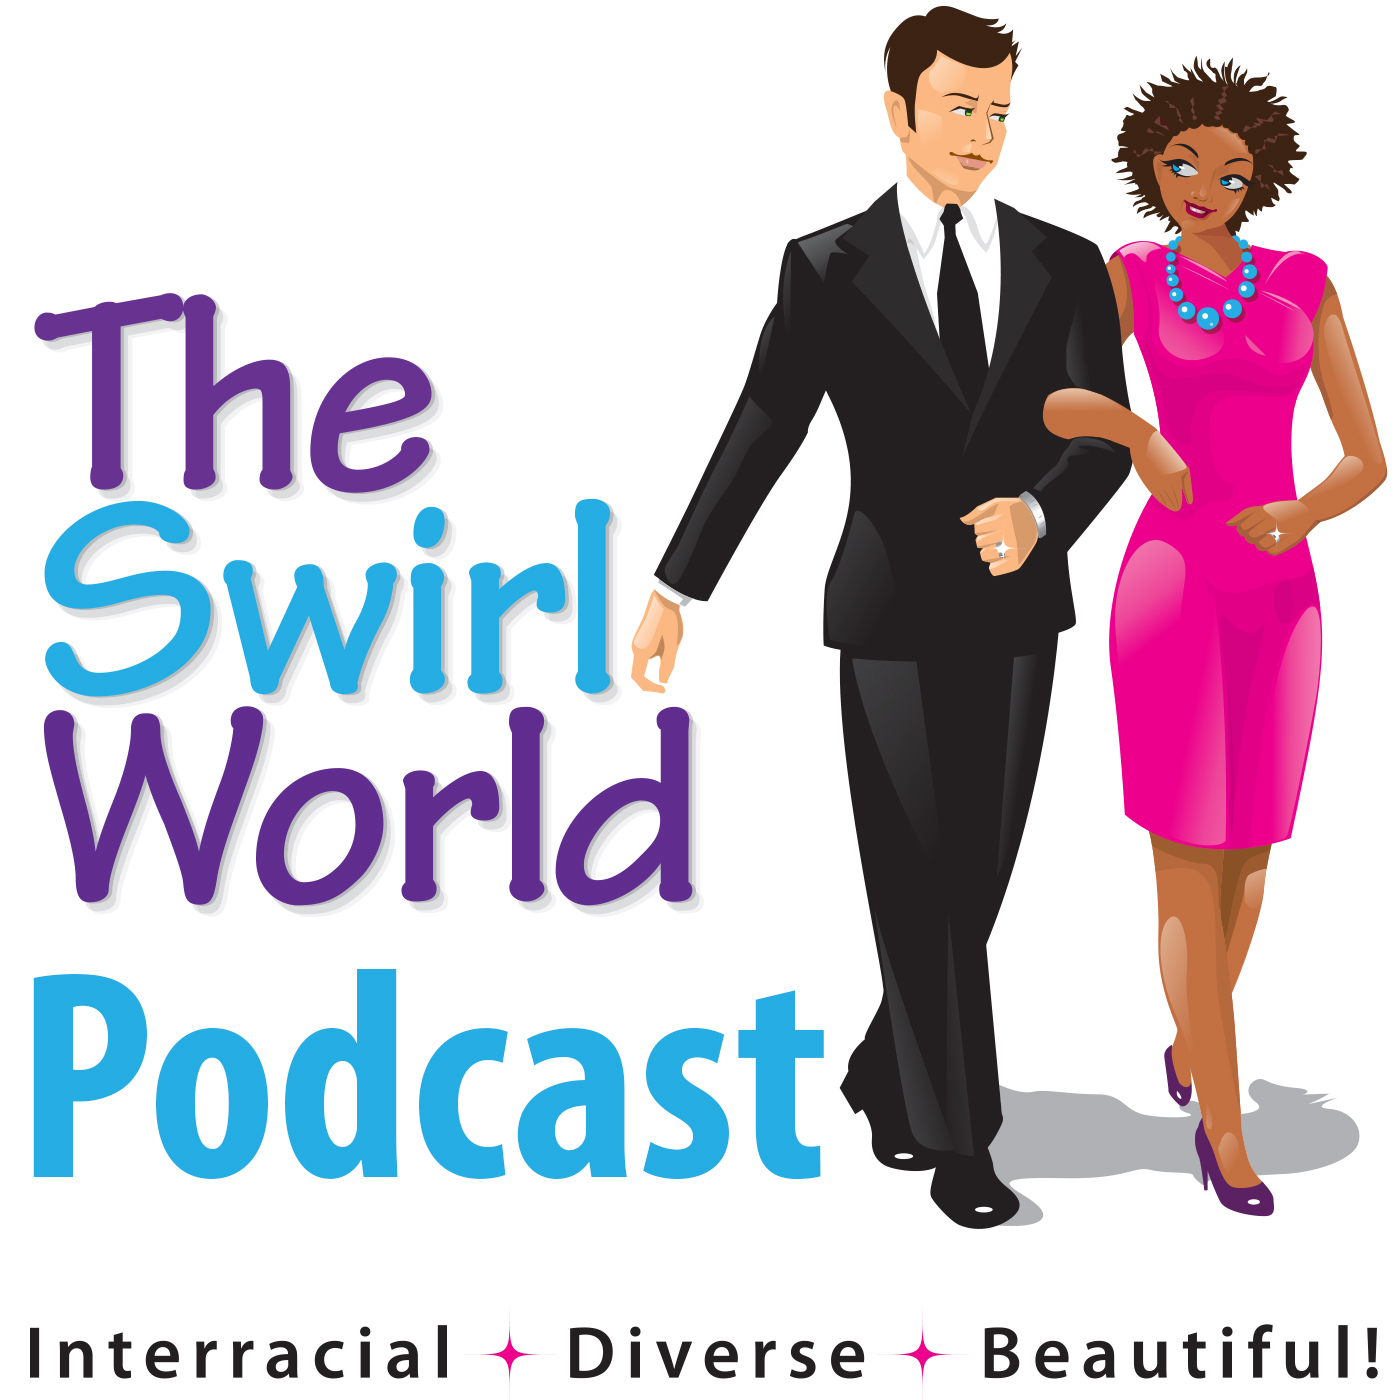 The Swirl World Podcast show art